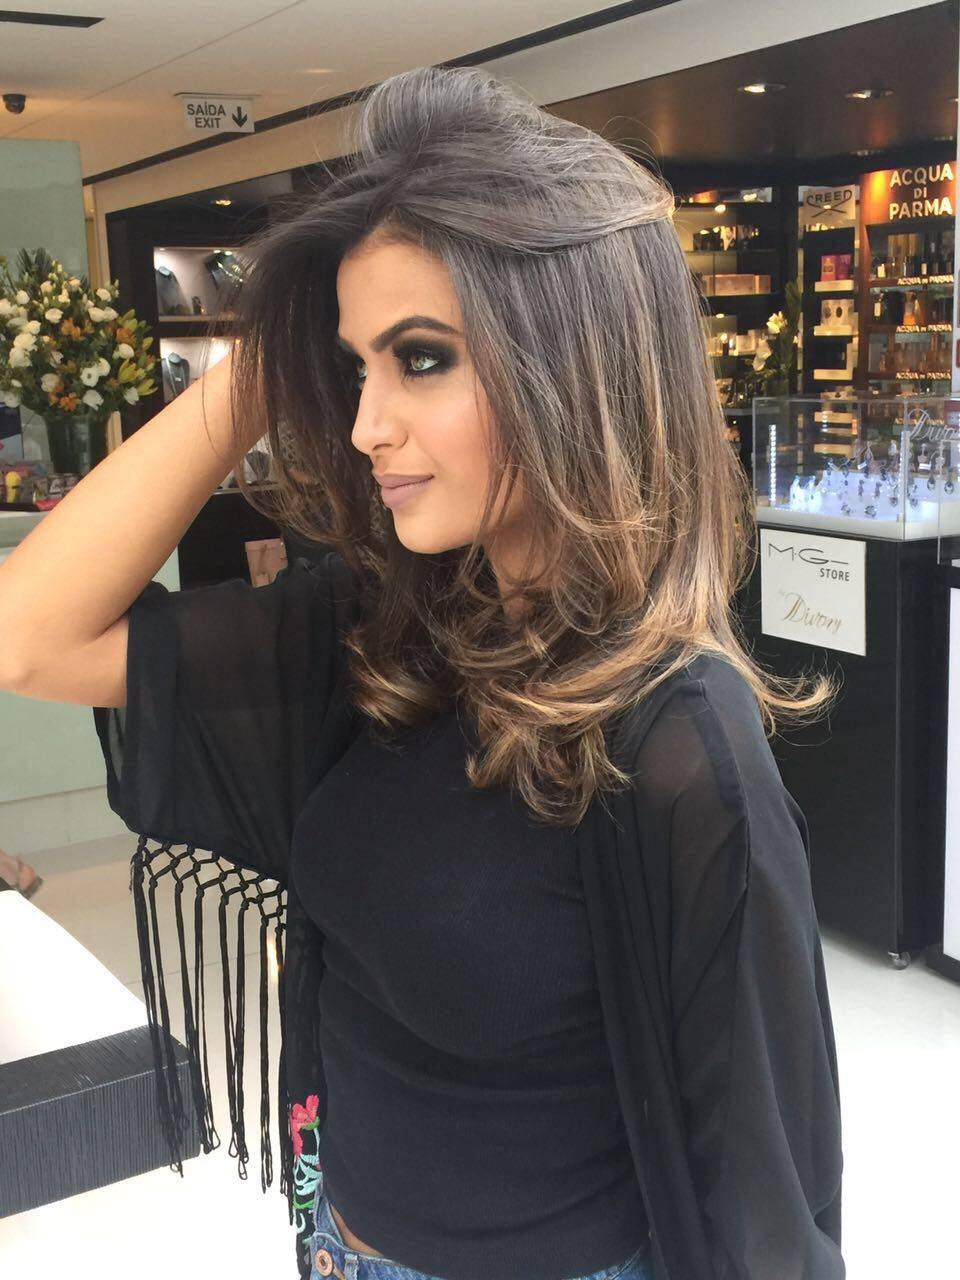 тенденции волос 2019 фото 10